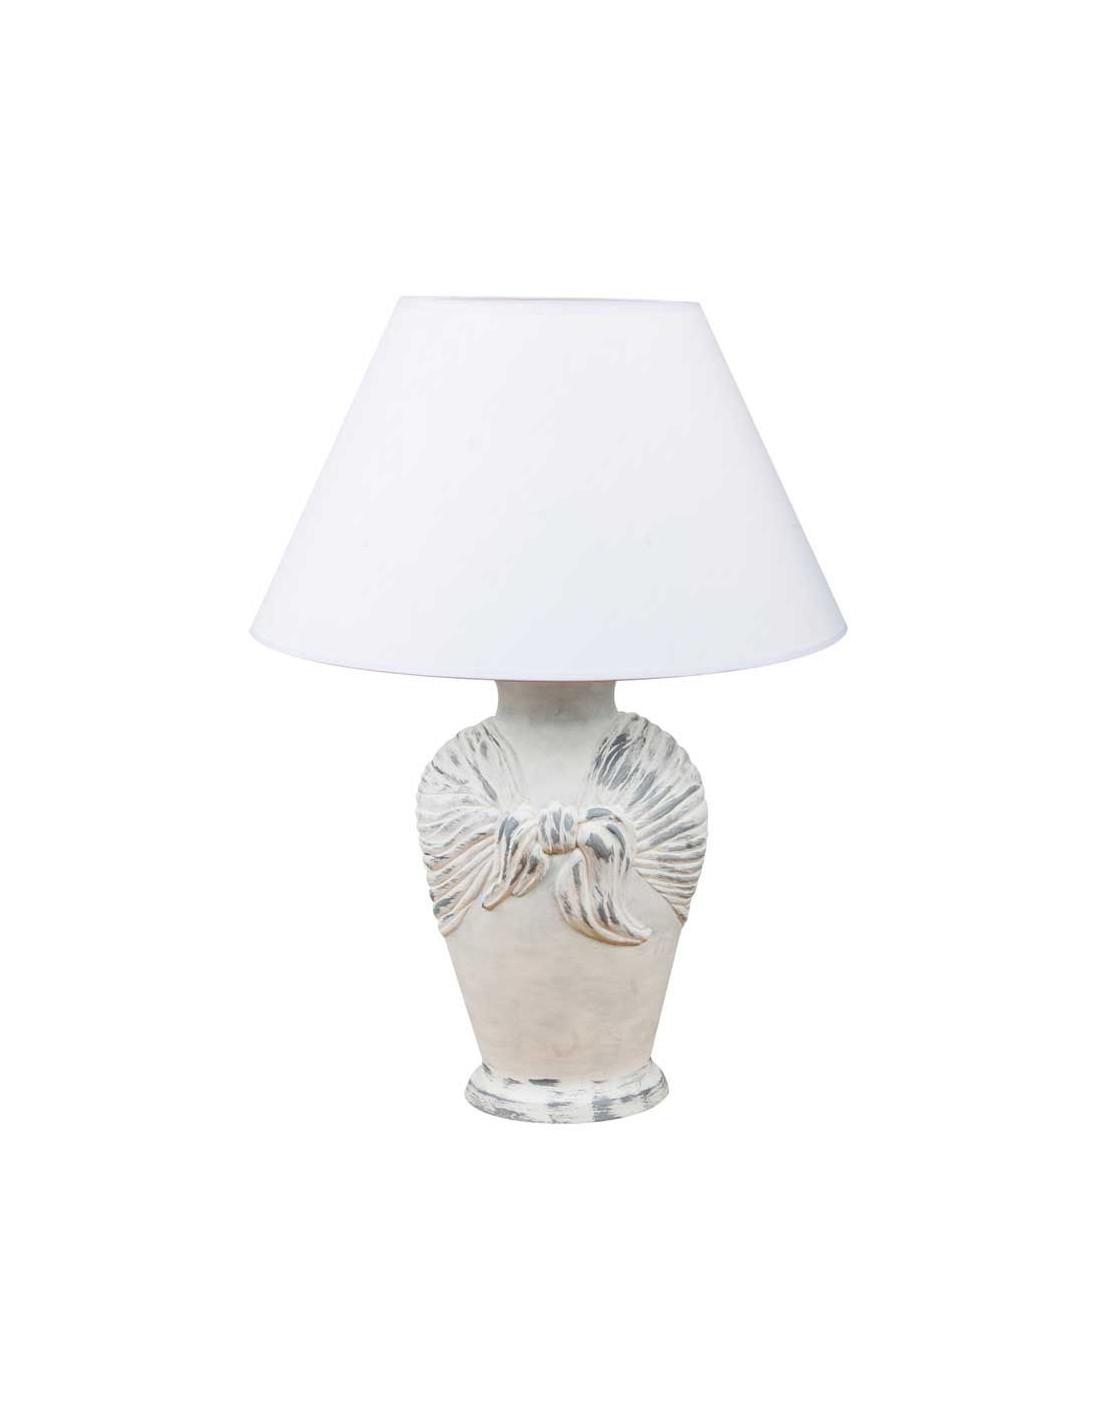 Night Lamp Arcor Fabric Shades Shabby Chic Style Base Fashion Home